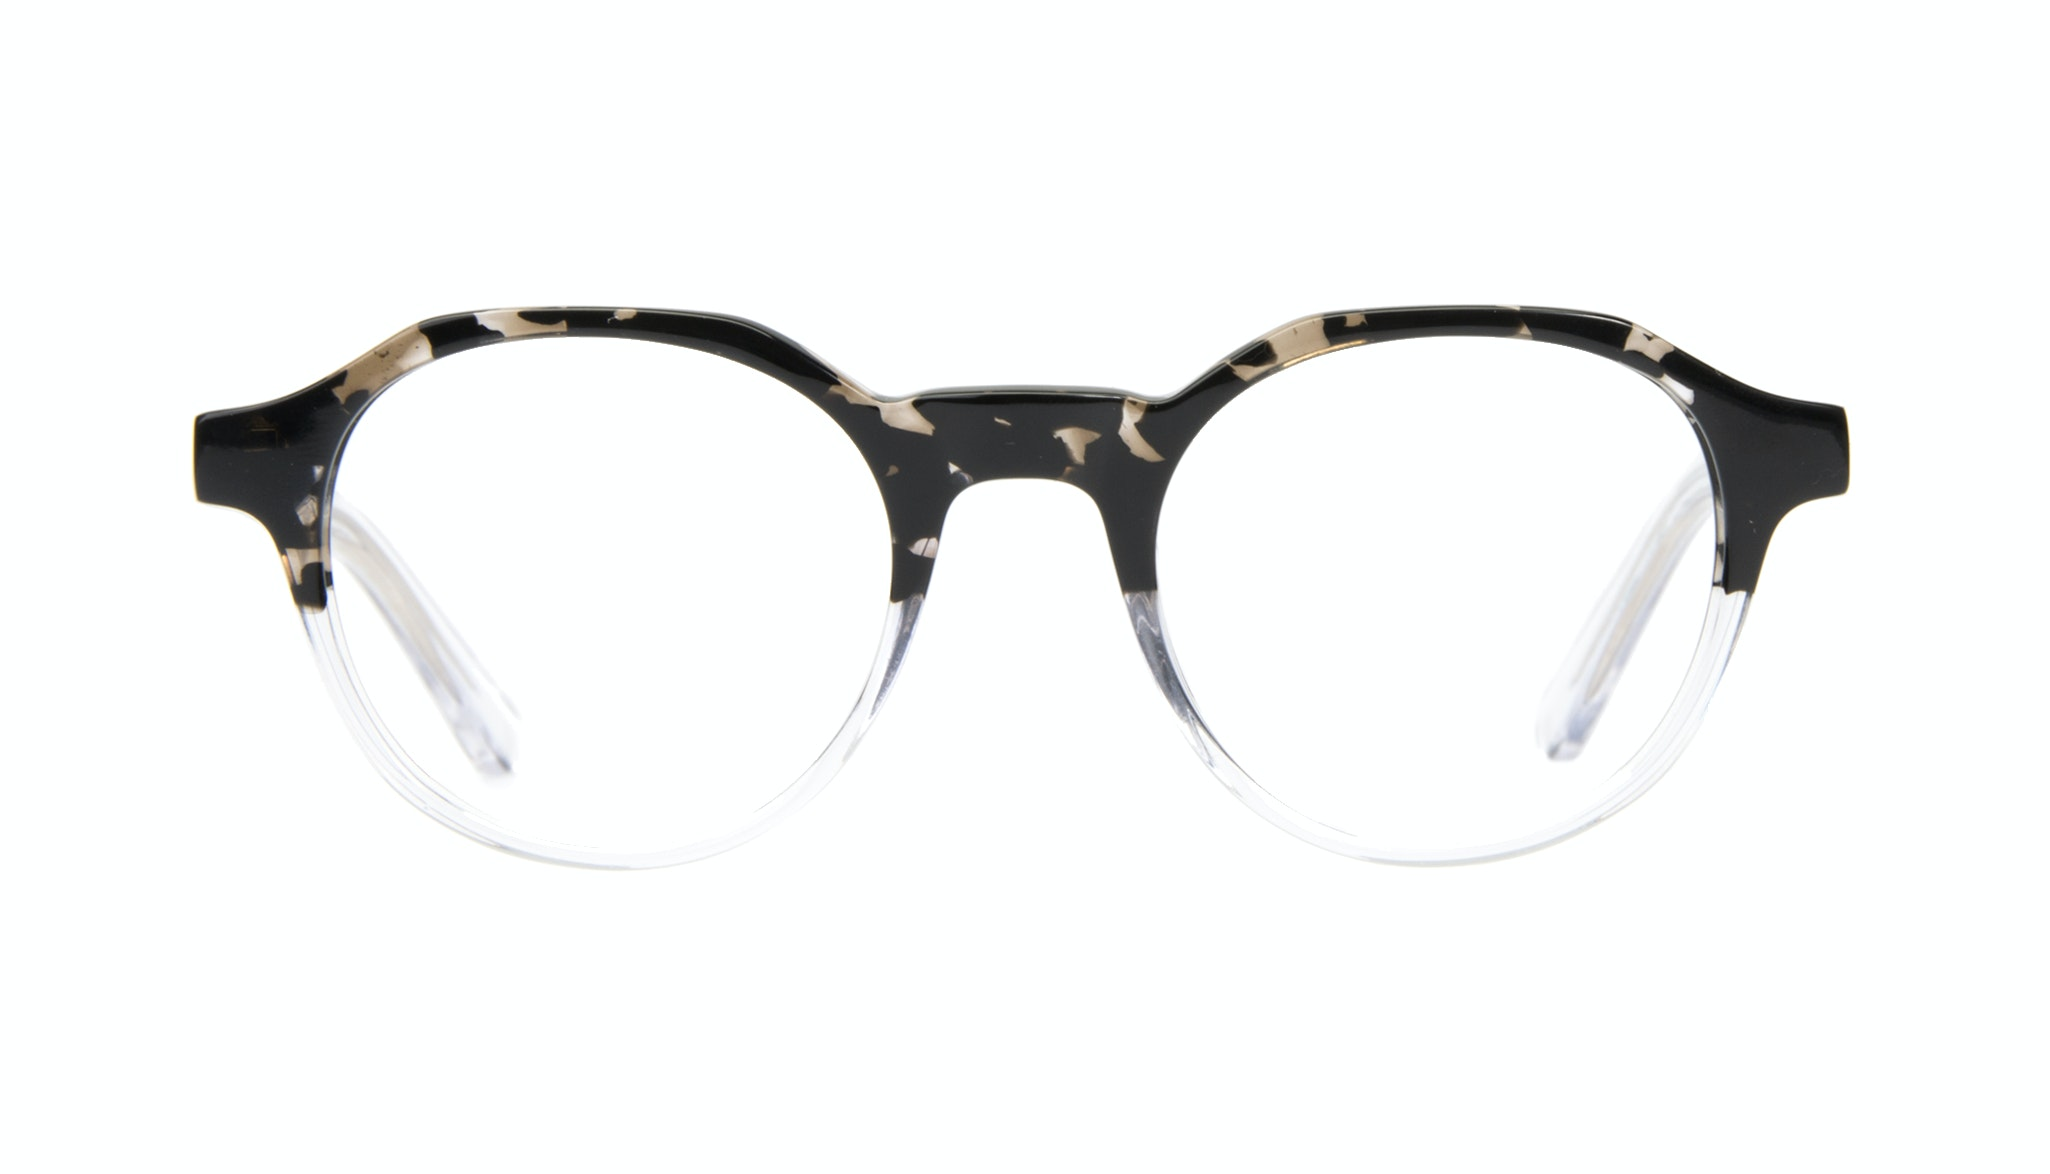 Affordable Fashion Glasses Round Eyeglasses Men Form Stone Clear